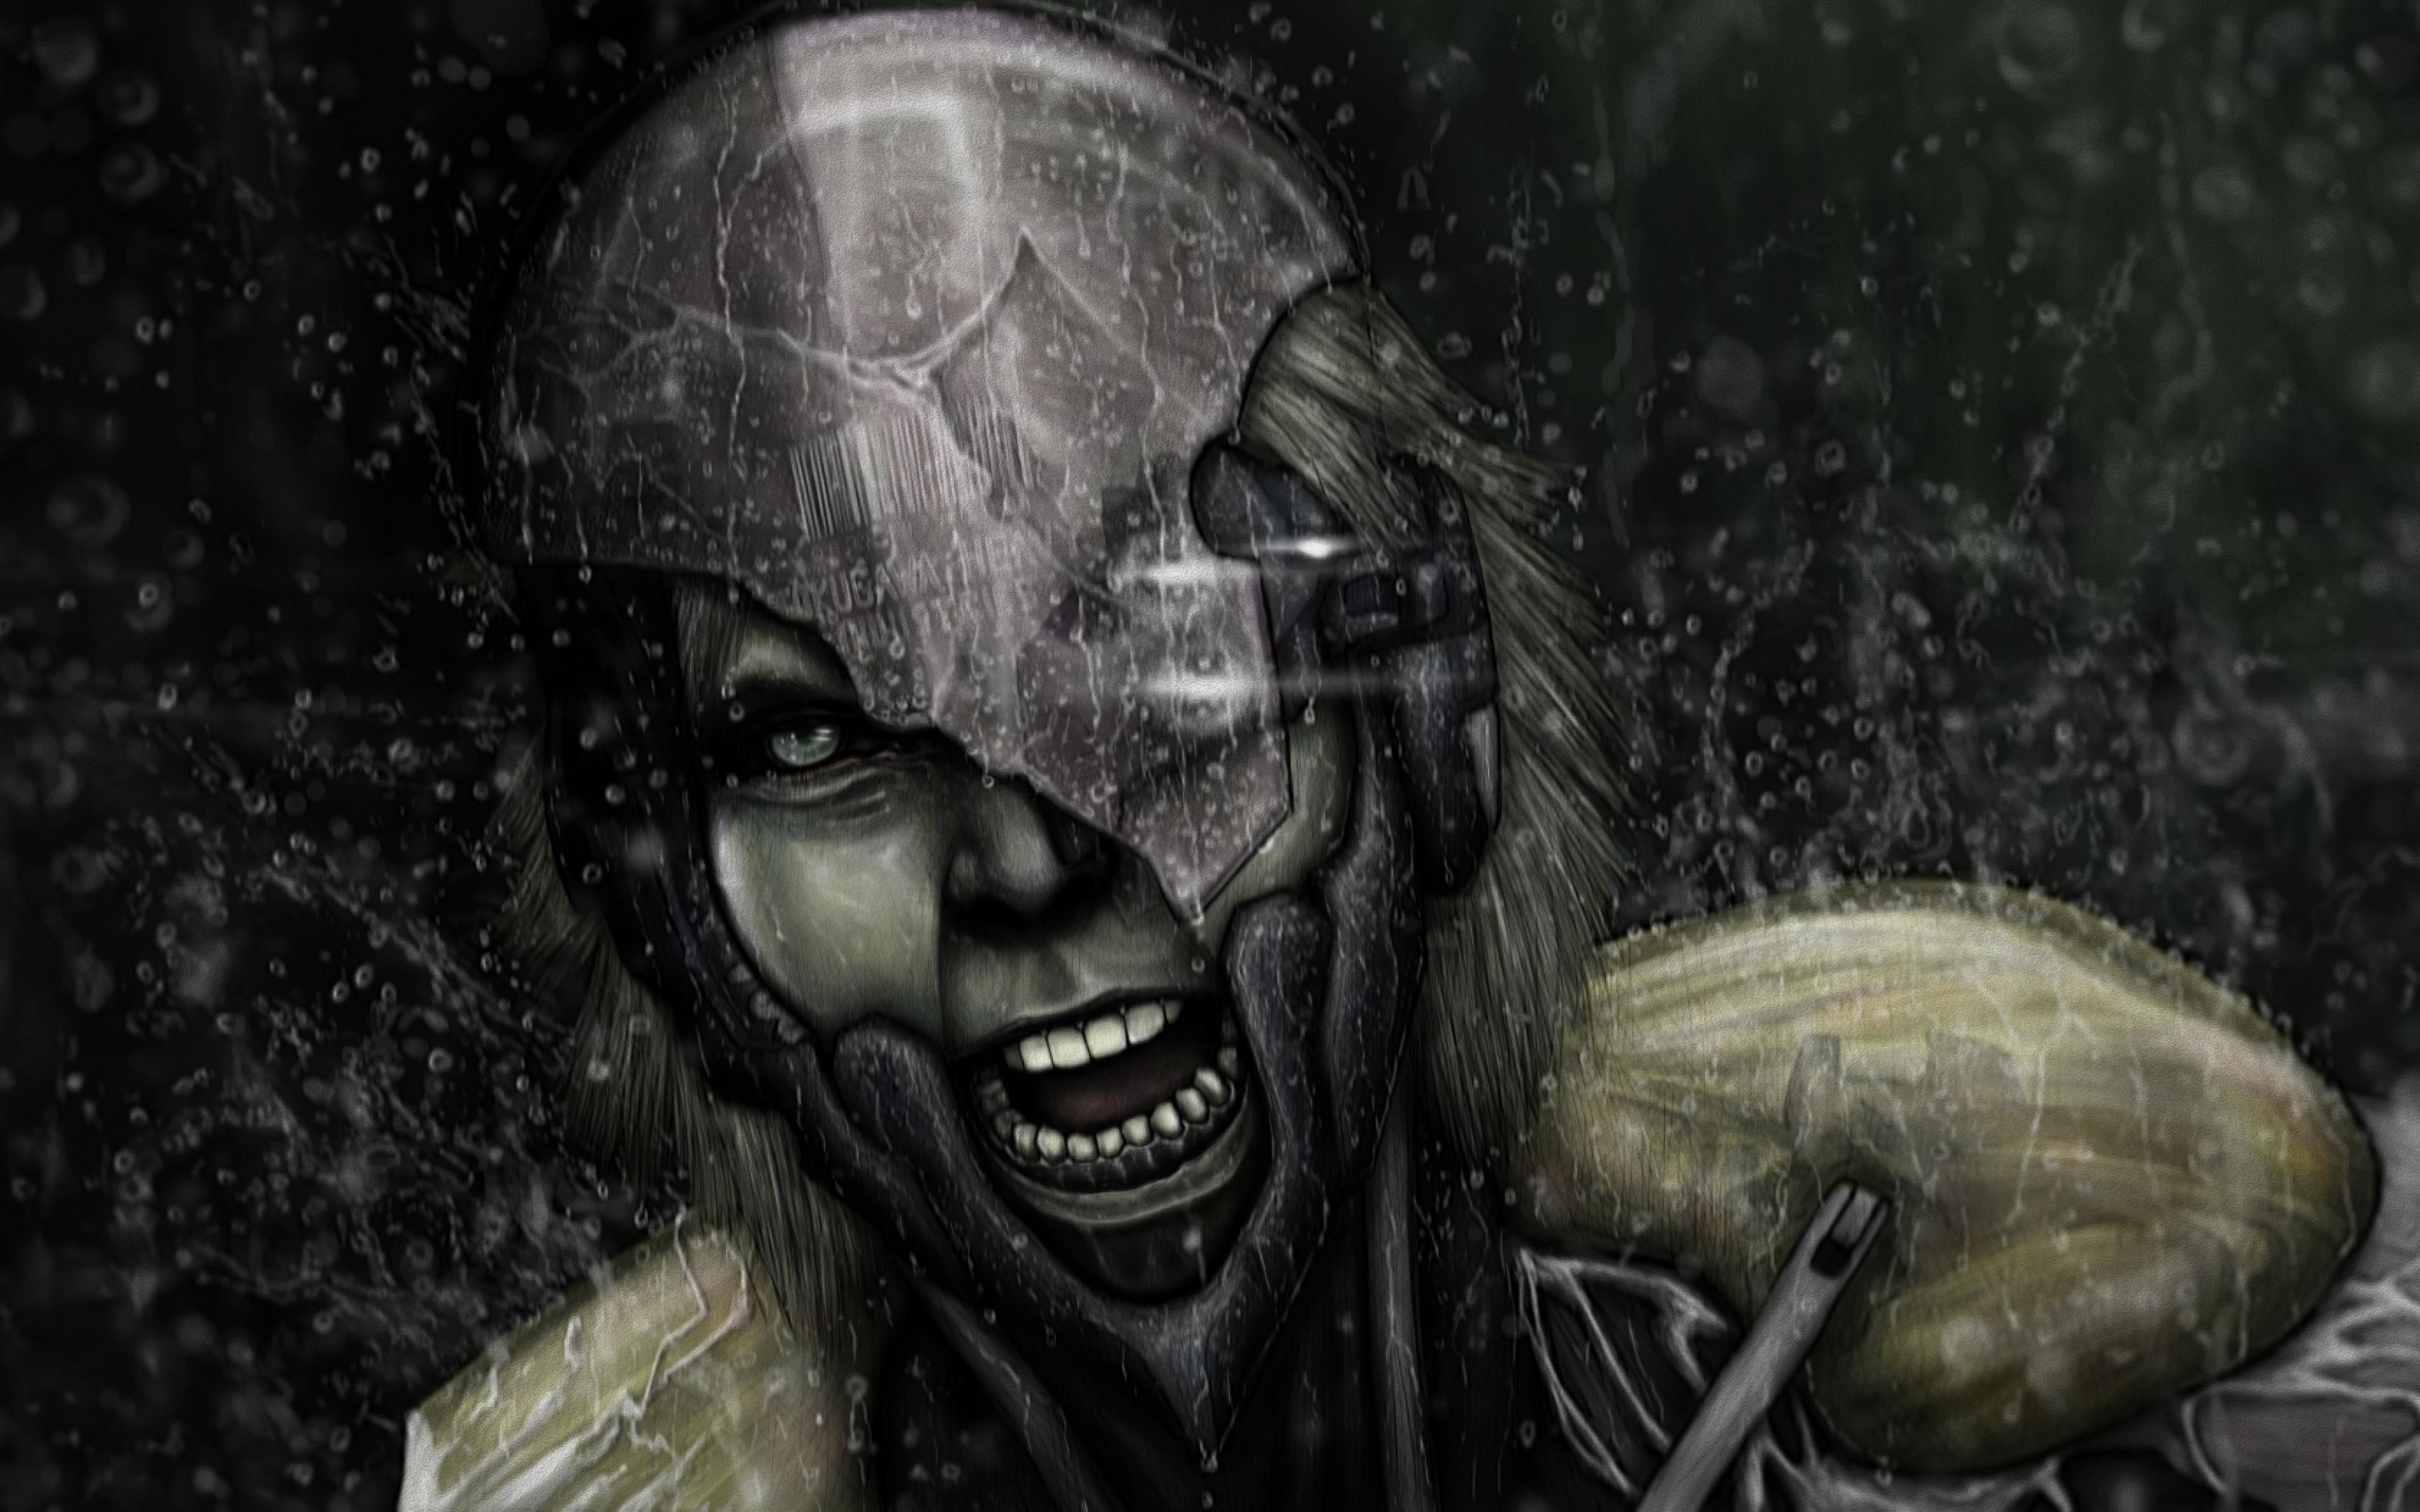 Metal Gear Rising Wallpaper 1280x720